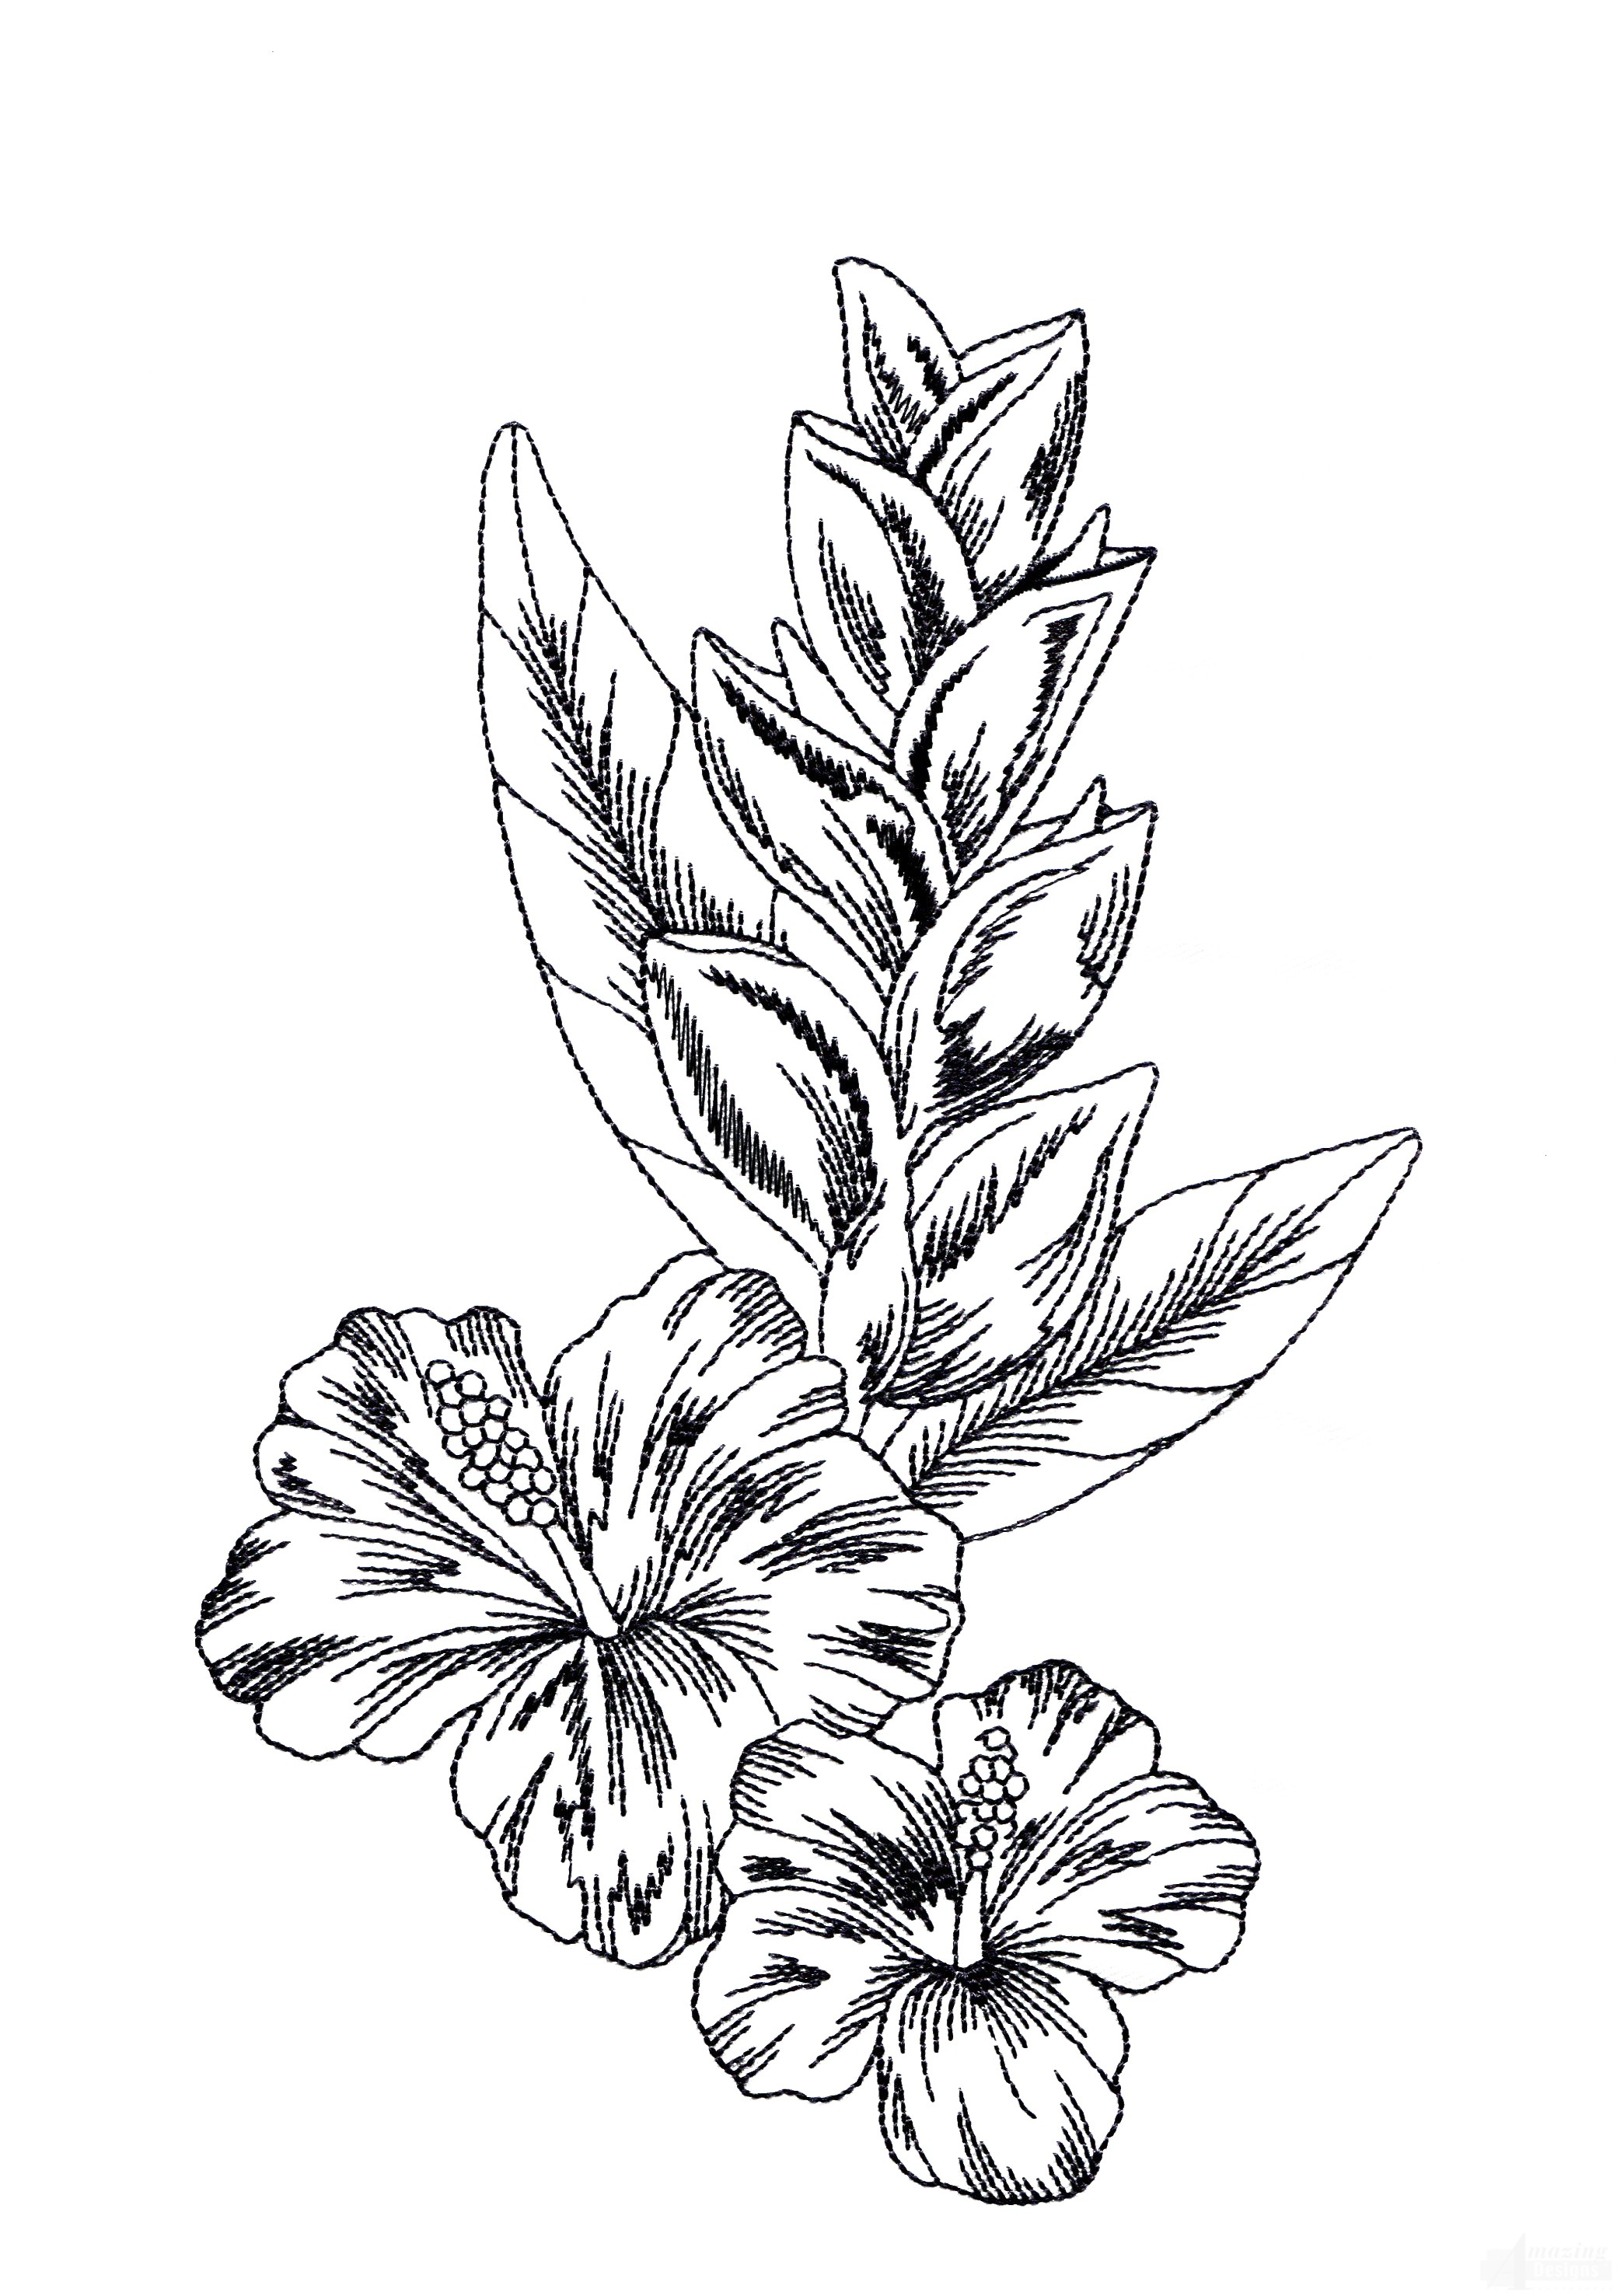 2080x2954 Exotic Flower Drawings Tropical Flower Drawings Free Download